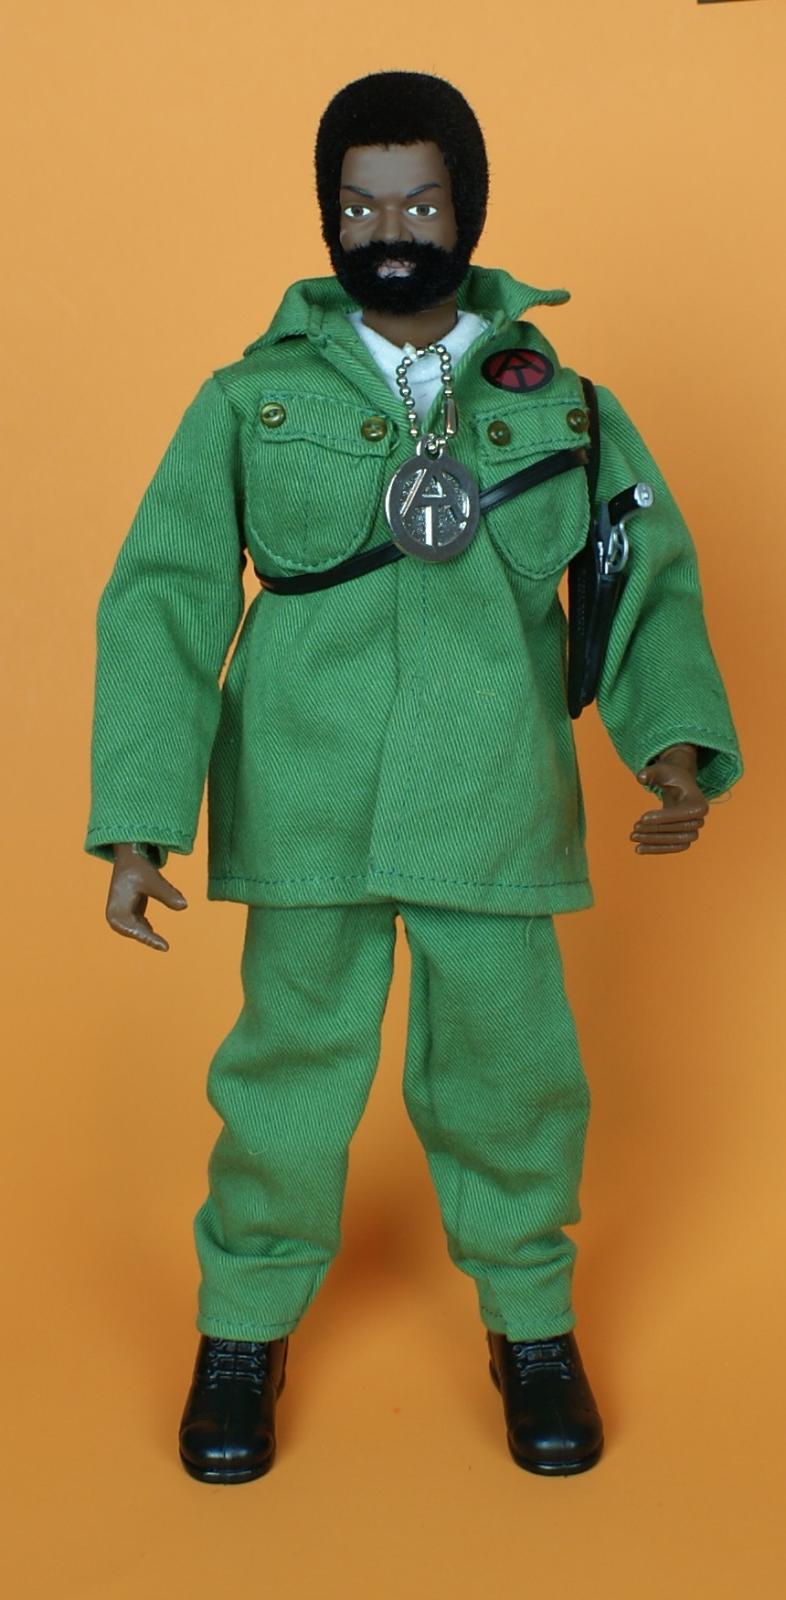 Hasbro g.i. joe mit commander actionfigur club.